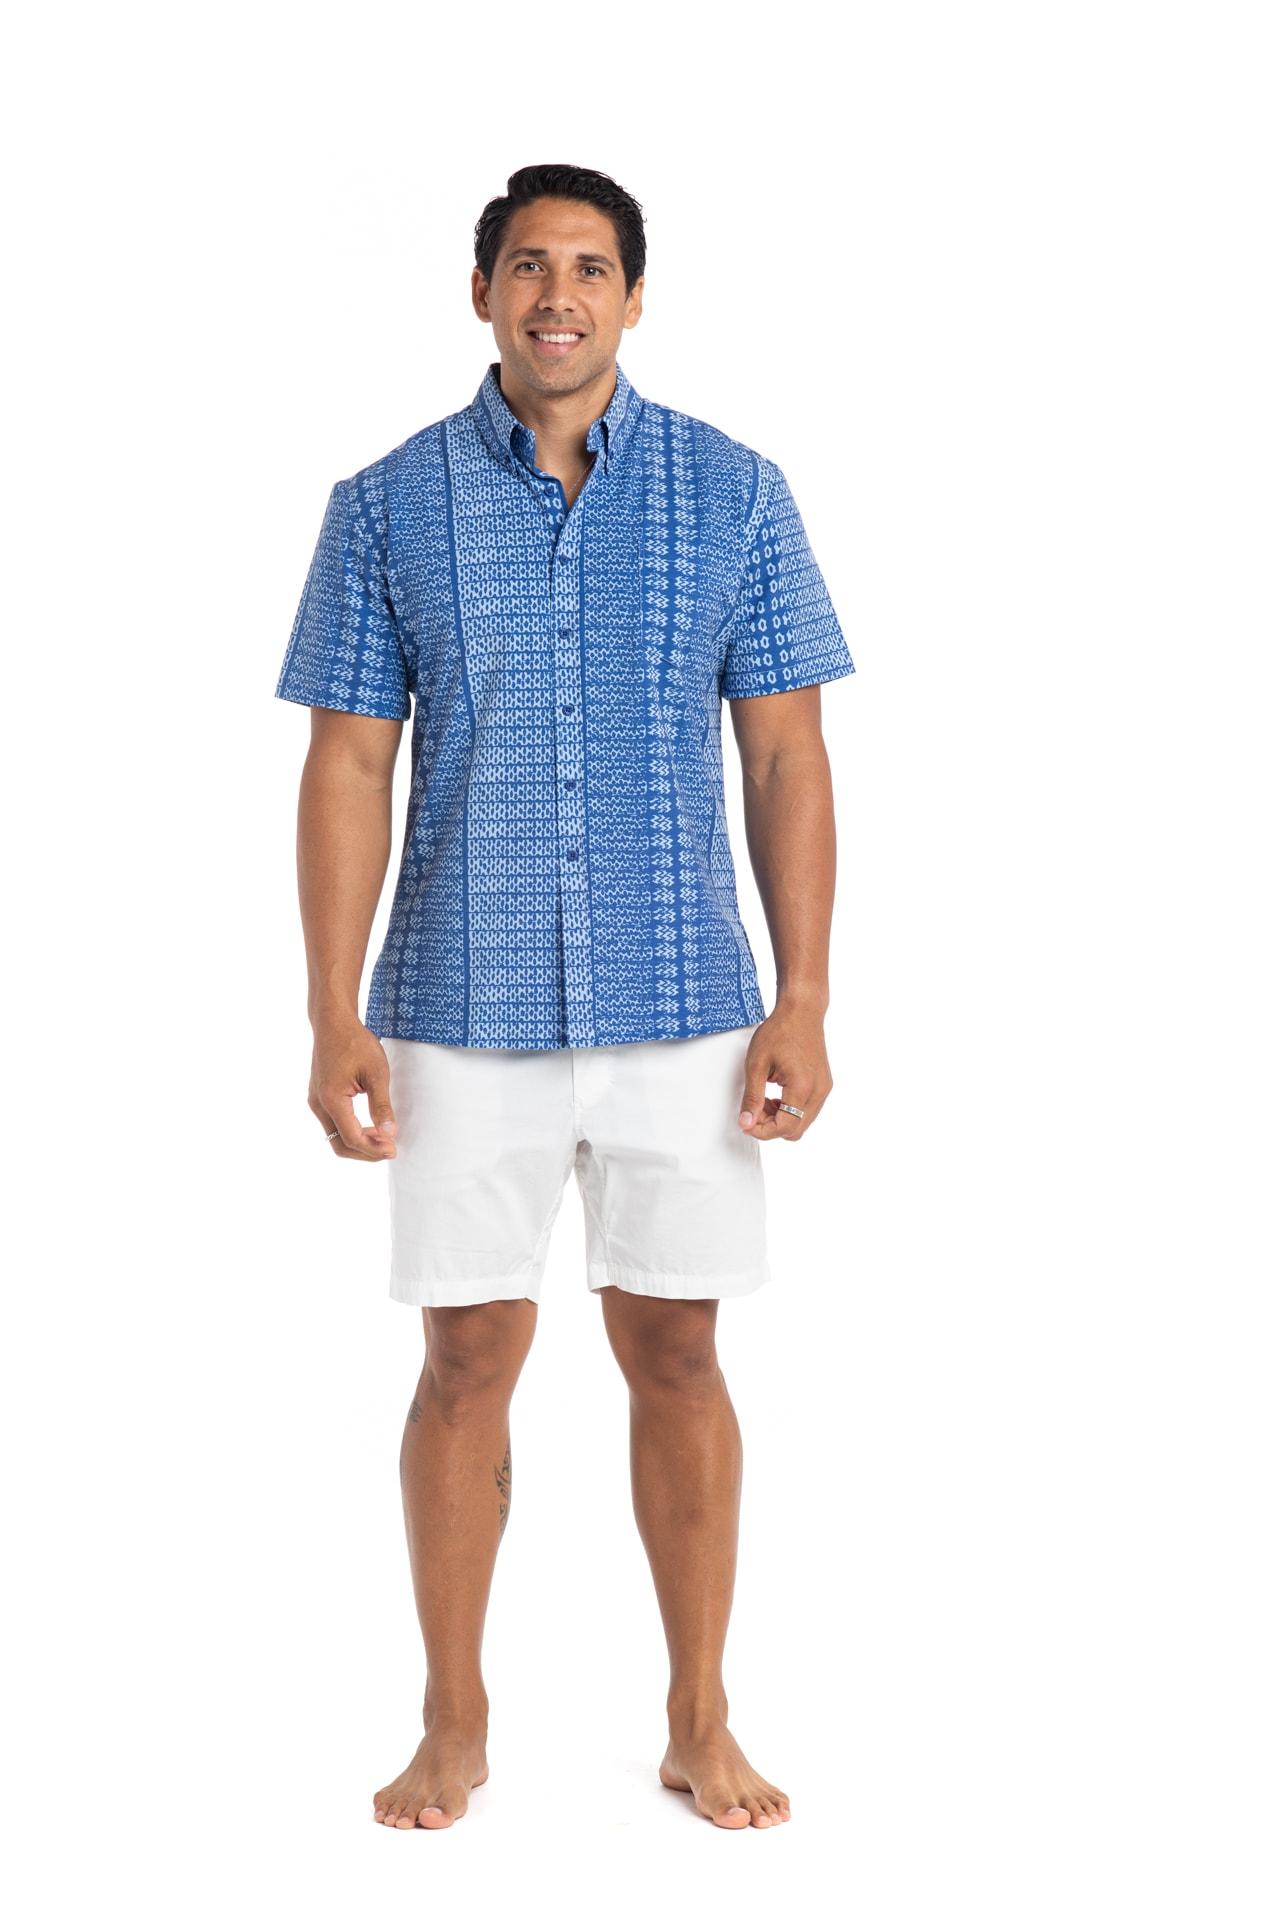 Male model wearing Mahalo Nui Shirt in Blue AkoaAkoa - Front View